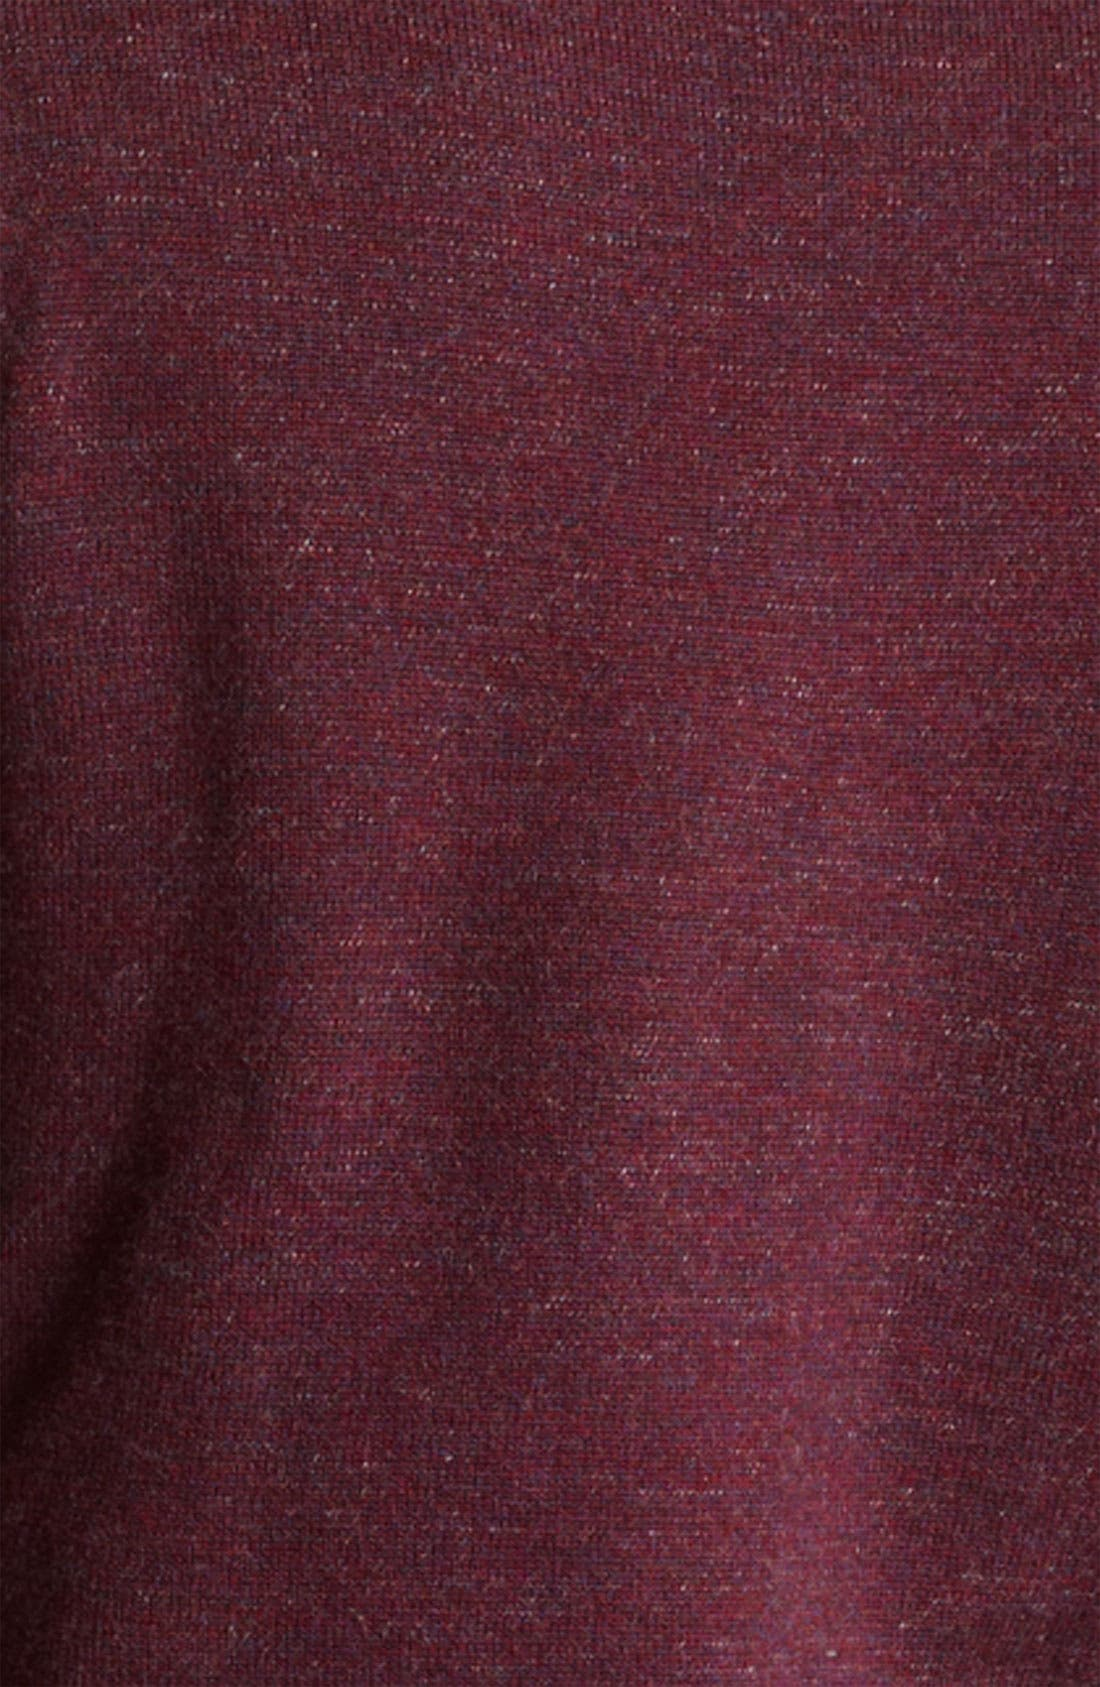 Alternate Image 3  - Todd Snyder Crewneck Sweatshirt